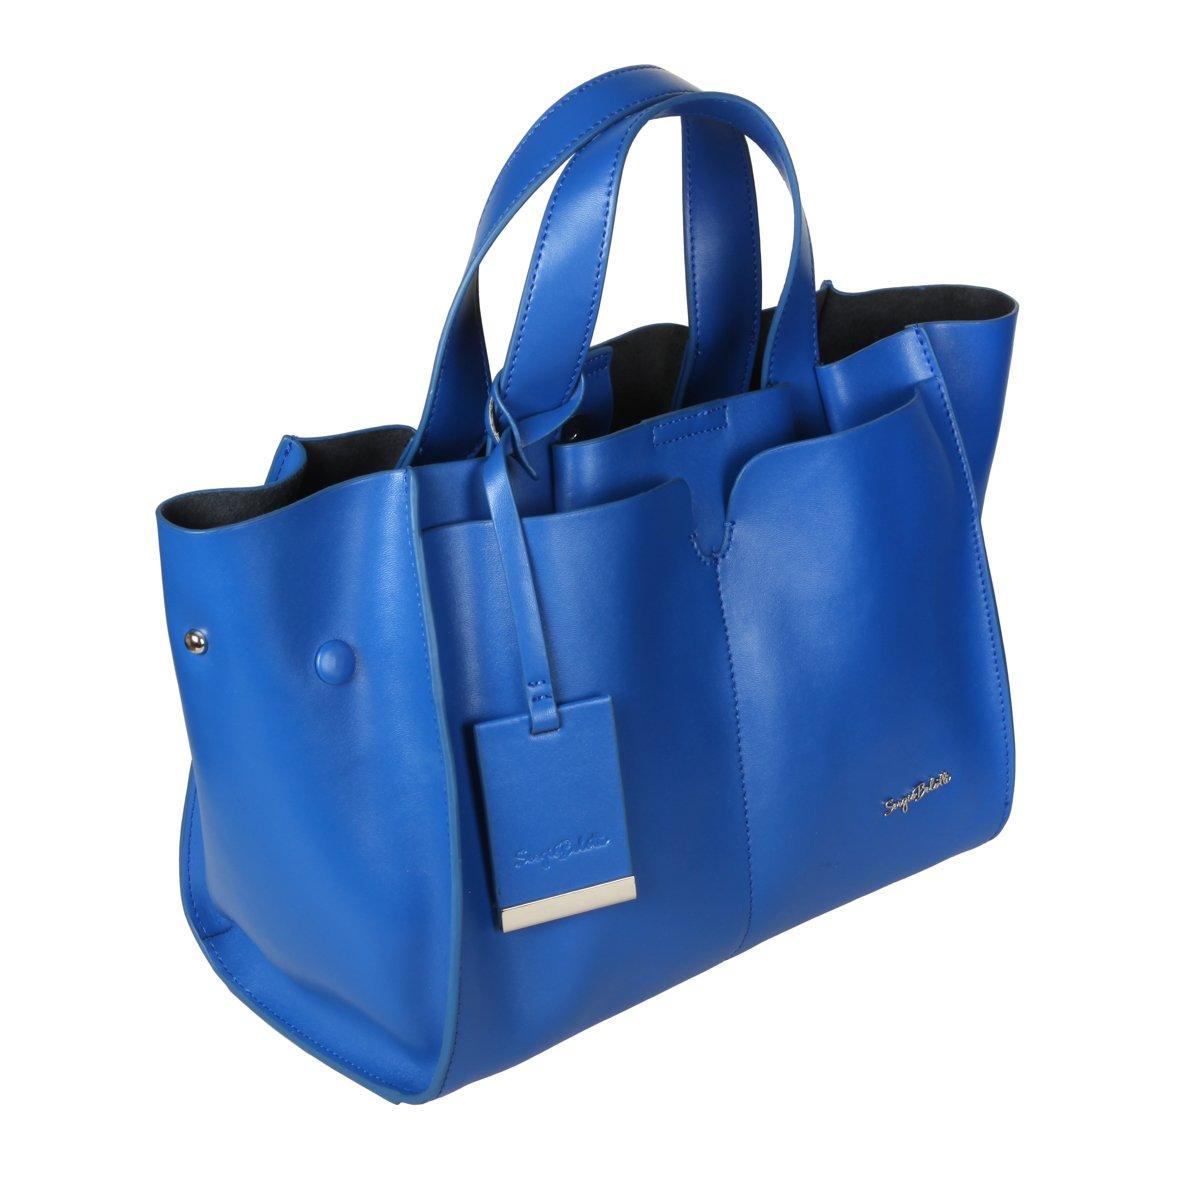 3ba7efe496ed Сумка Sergio Belotti 28 blue, 44x23.5 см, натуральная кожа, цвет ...